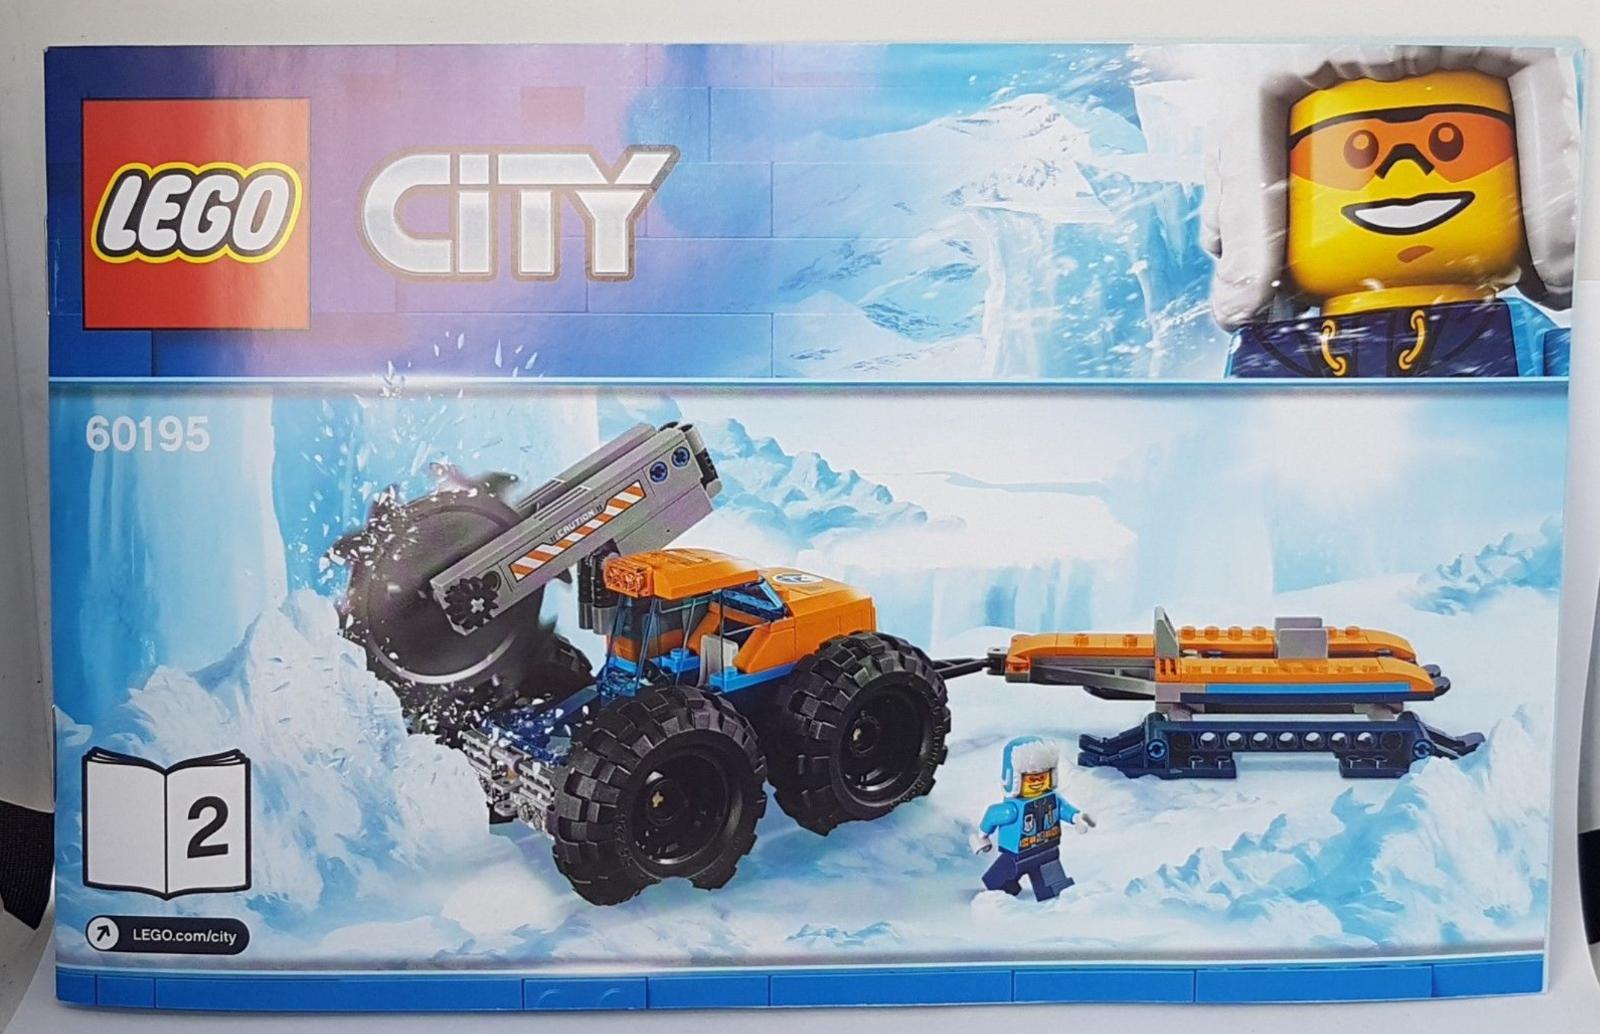 LEGO City. Mobile Saw & & &  Hauling Platform split from 60195  No figures no box. 8ddc77